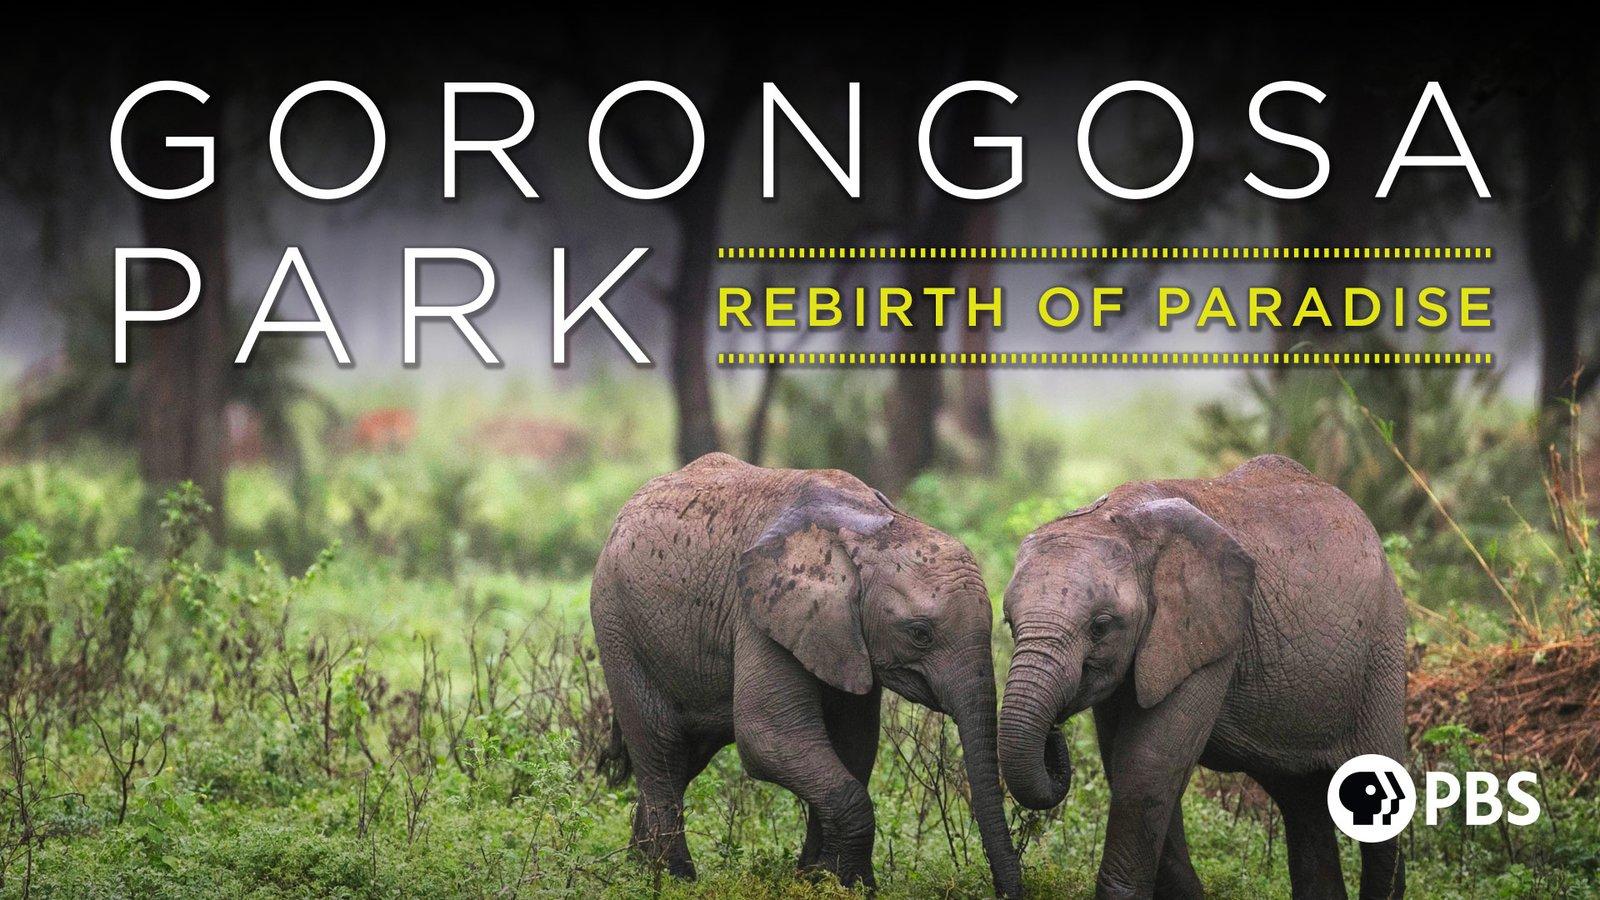 Gorongosa Park - Rebirth of Paradise